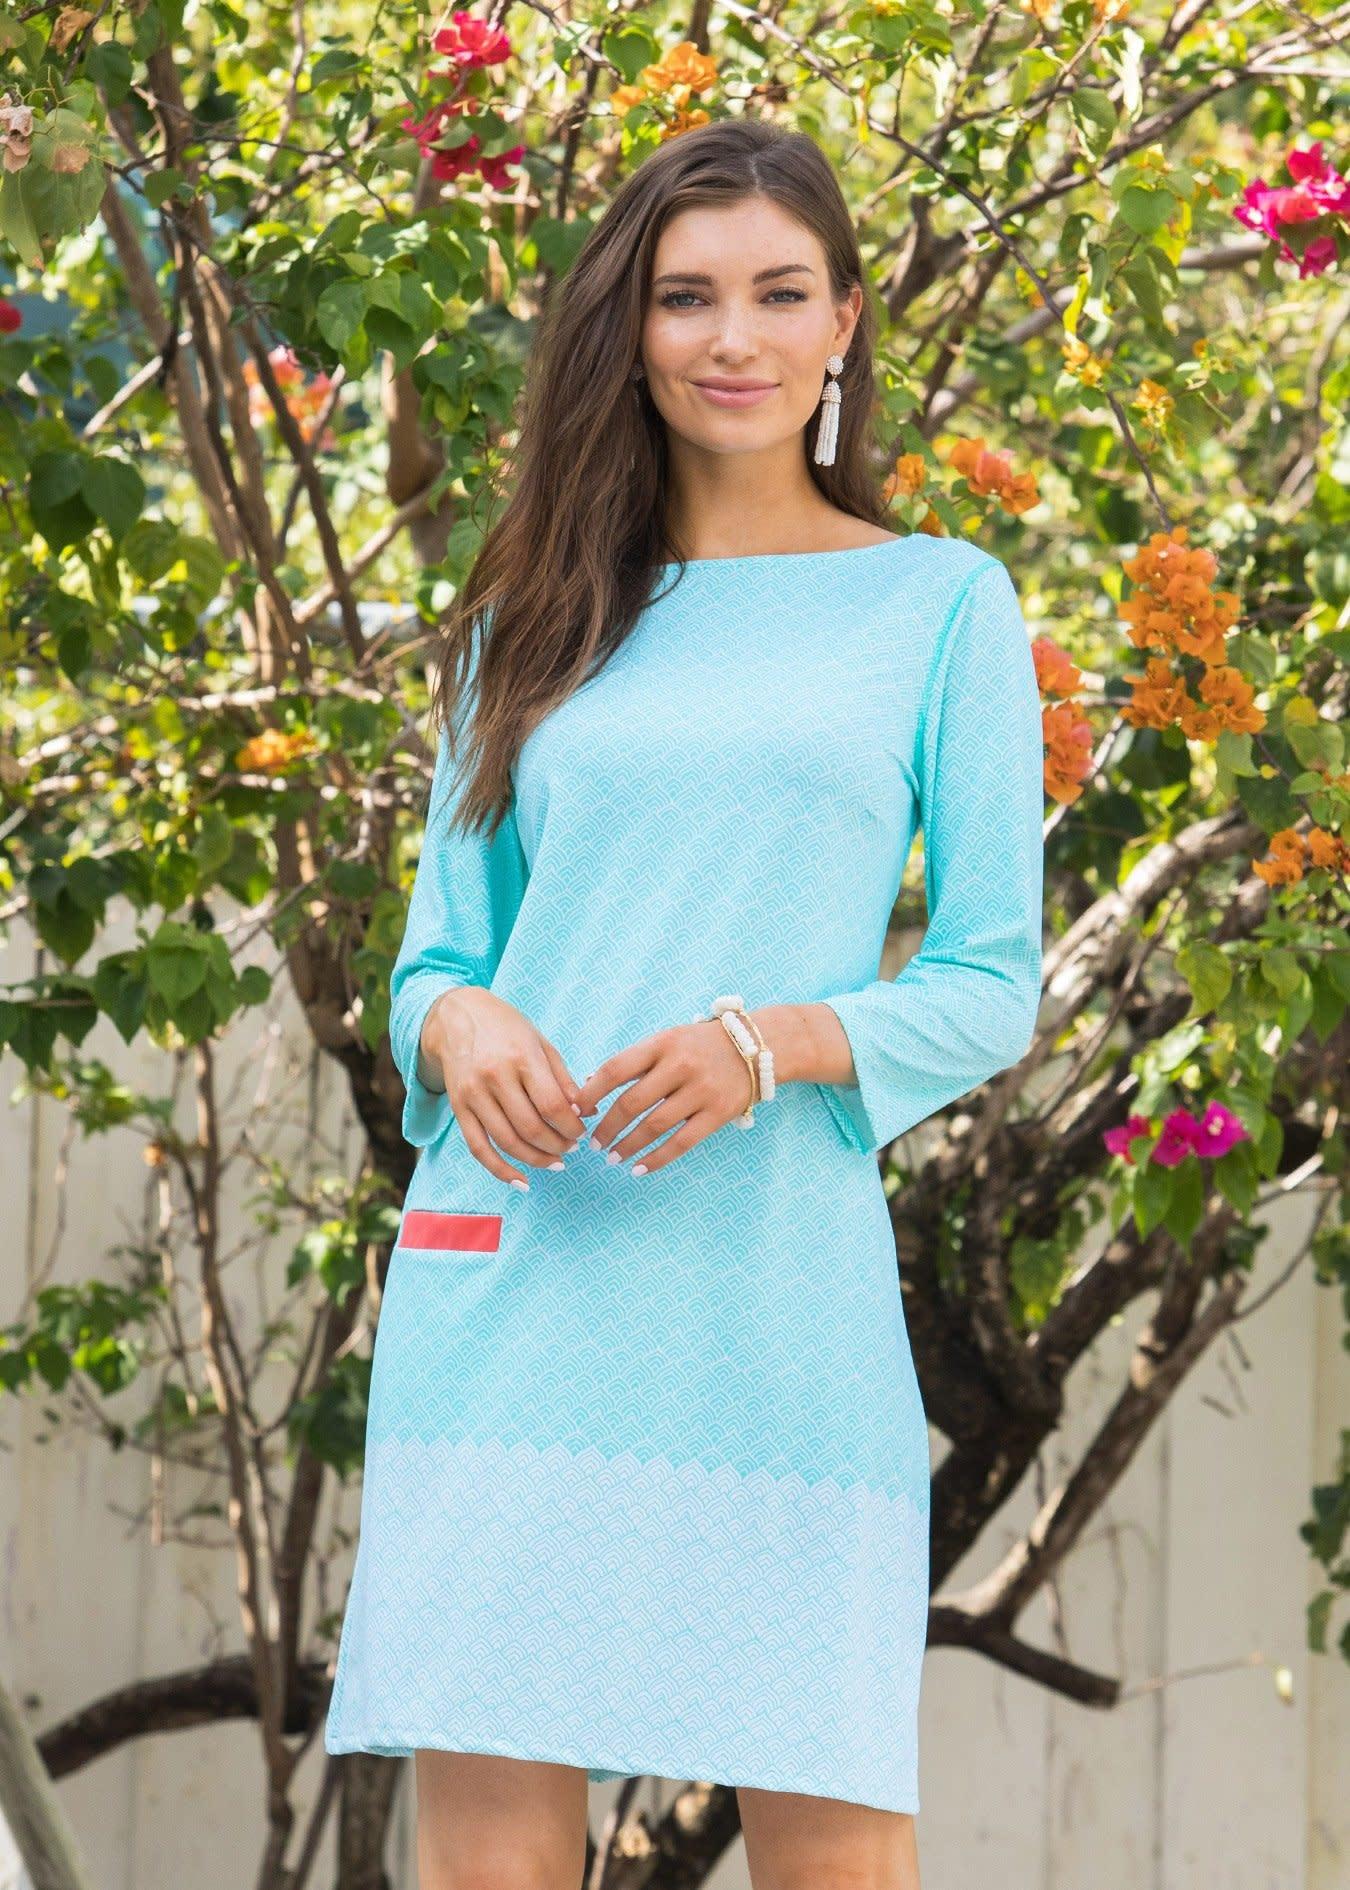 Cabana Life Coral Tides Mint Shift Dress